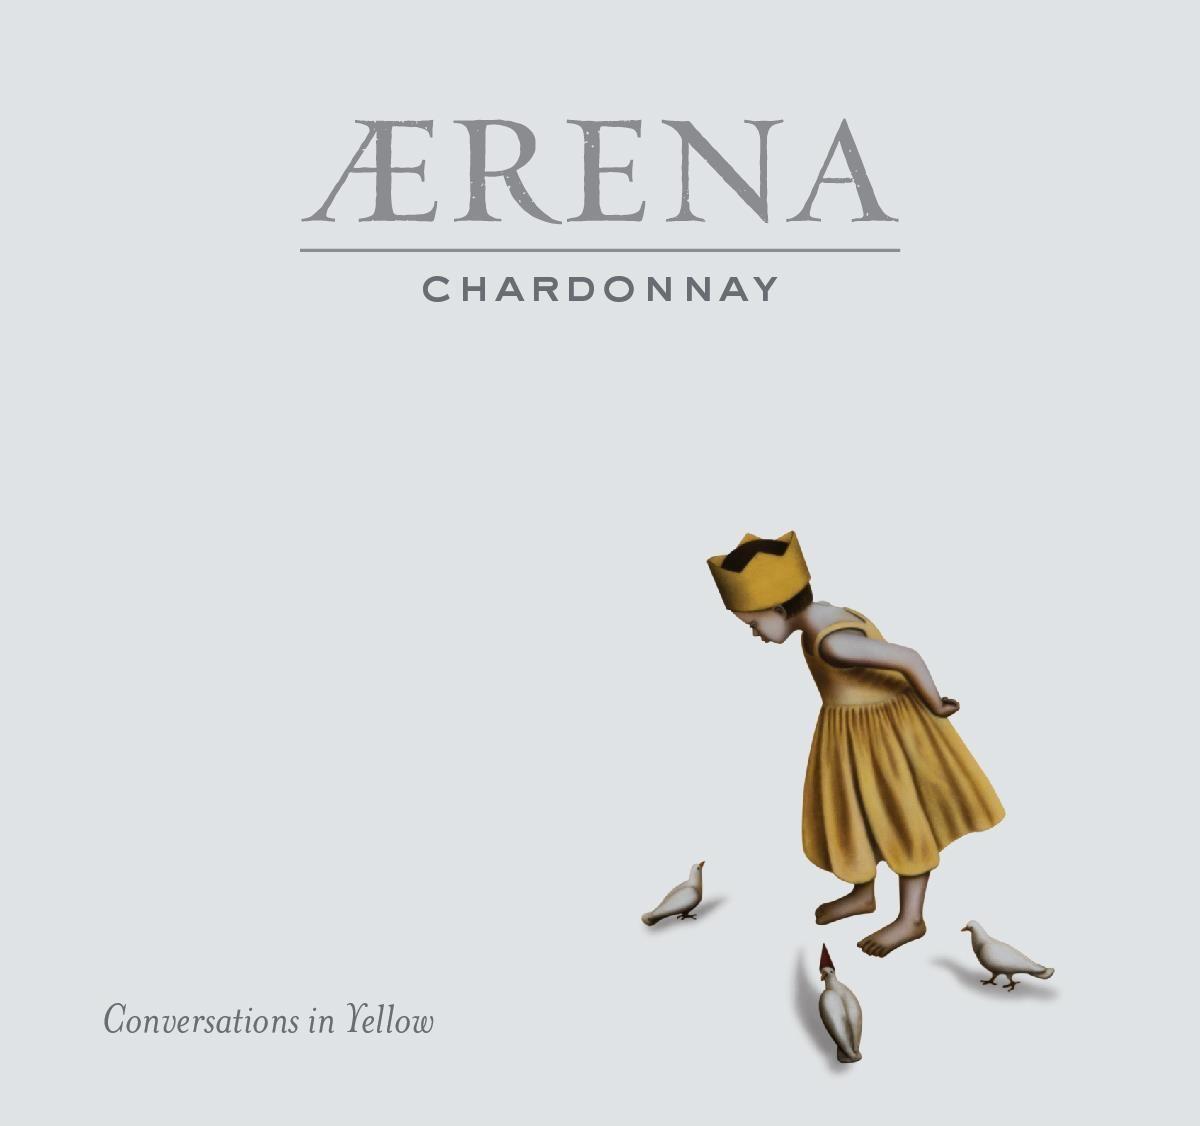 AERENA by Blackbird Vineyards Chardonnay 2017